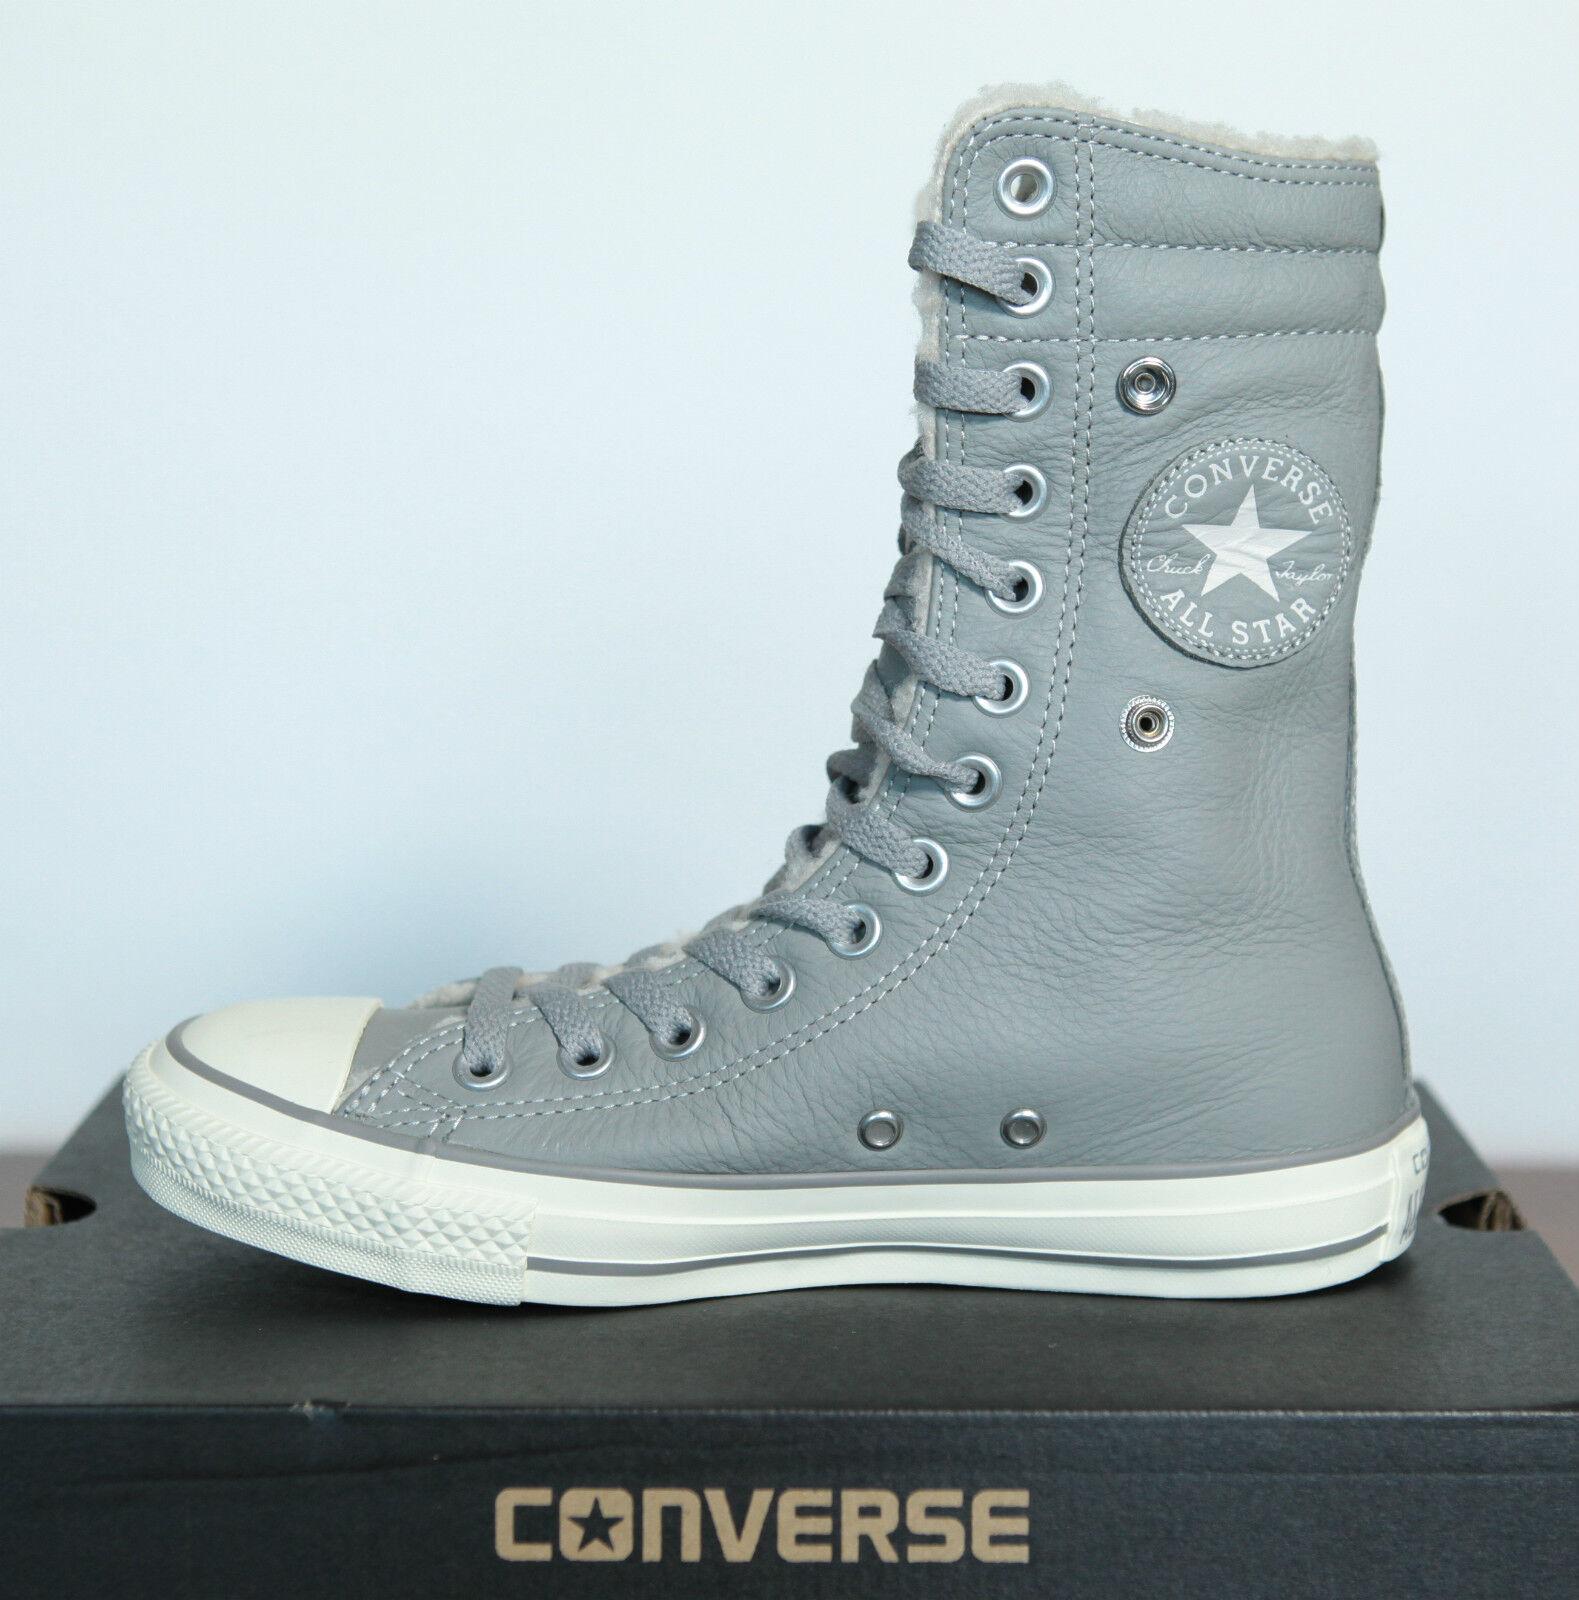 Neu All Star Converse Chucks X Hi Knee Leder gefüttert 540400c Gr.35 UK 3